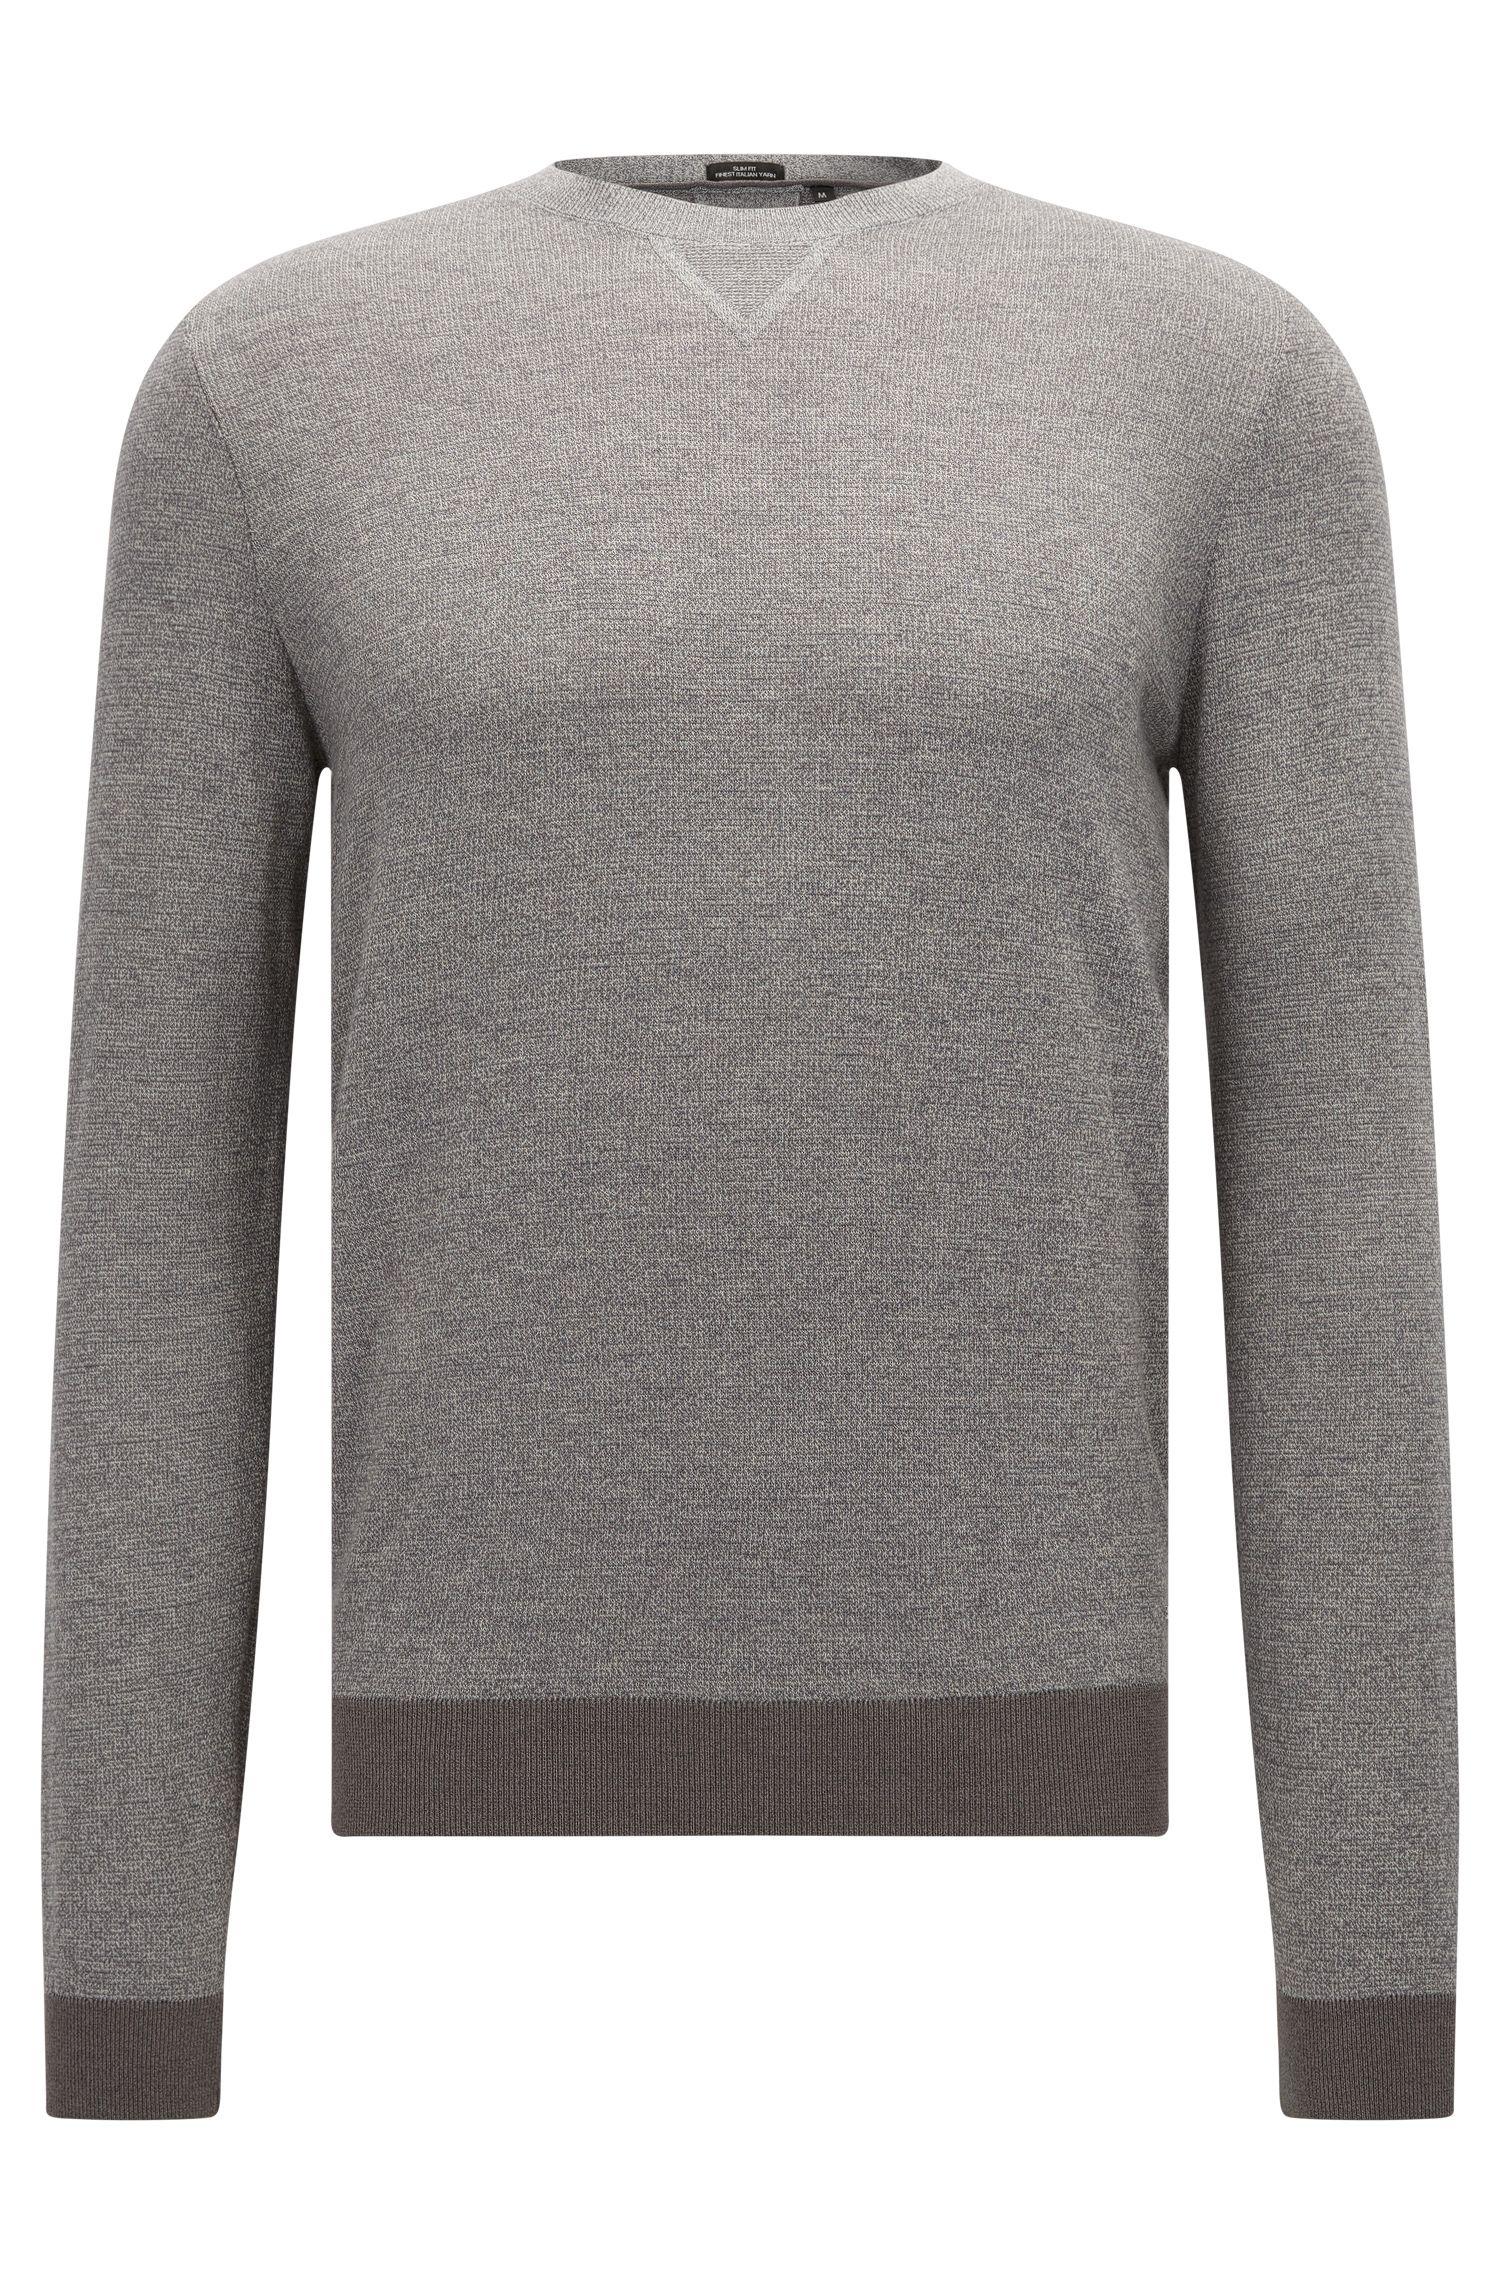 Jersey slim fit de mouliné en mezcla de lana y algodón